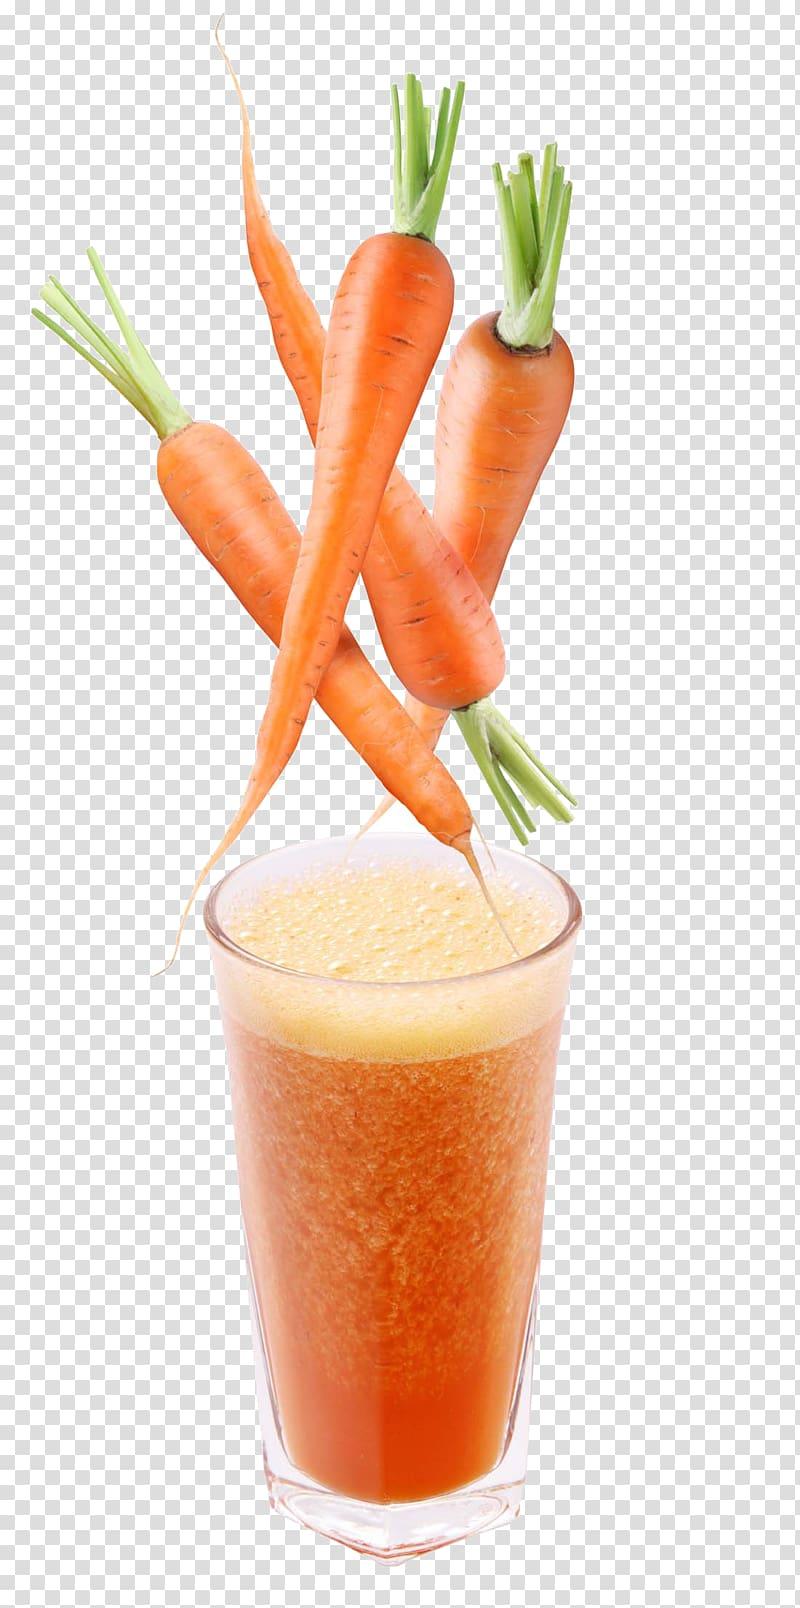 Seven juice clipart jpg stock Carrot juice Carrot juice Drink, carrot transparent ... jpg stock